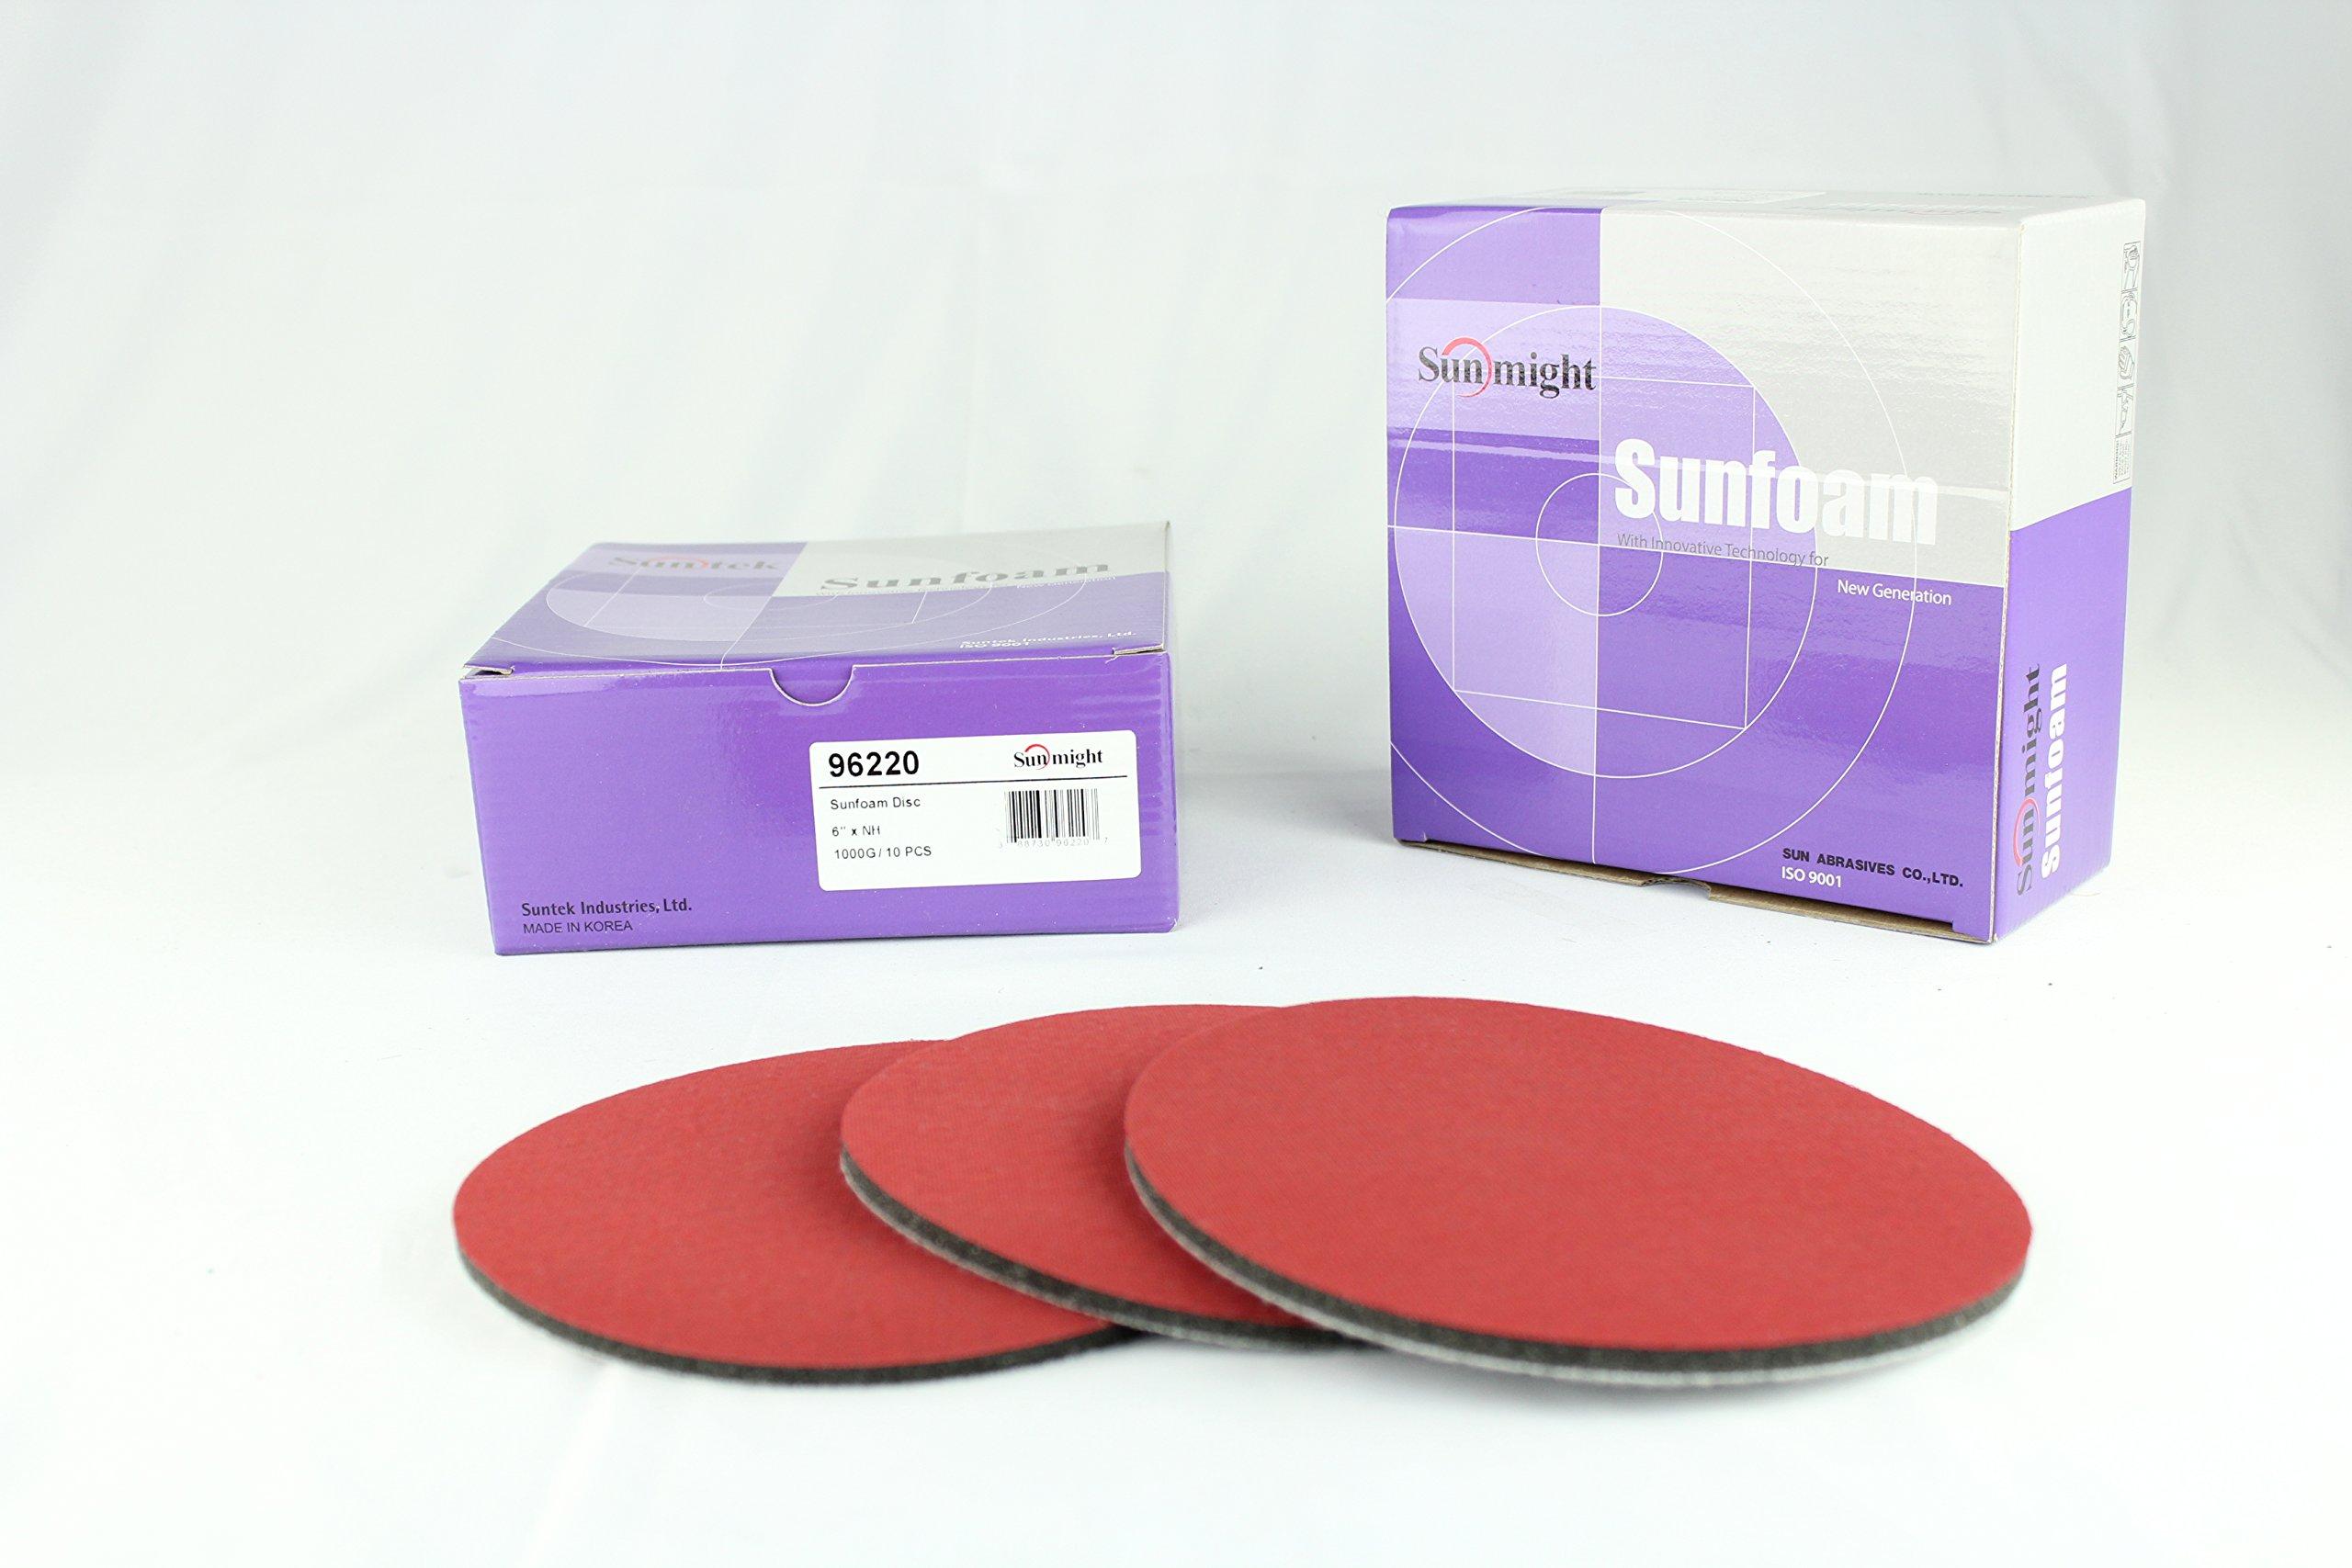 Sunmight 96220 1 Pack 6'' No Hole Velcro Foam Disc (Sunfoam Grit 1000) by Sunmight (Image #4)